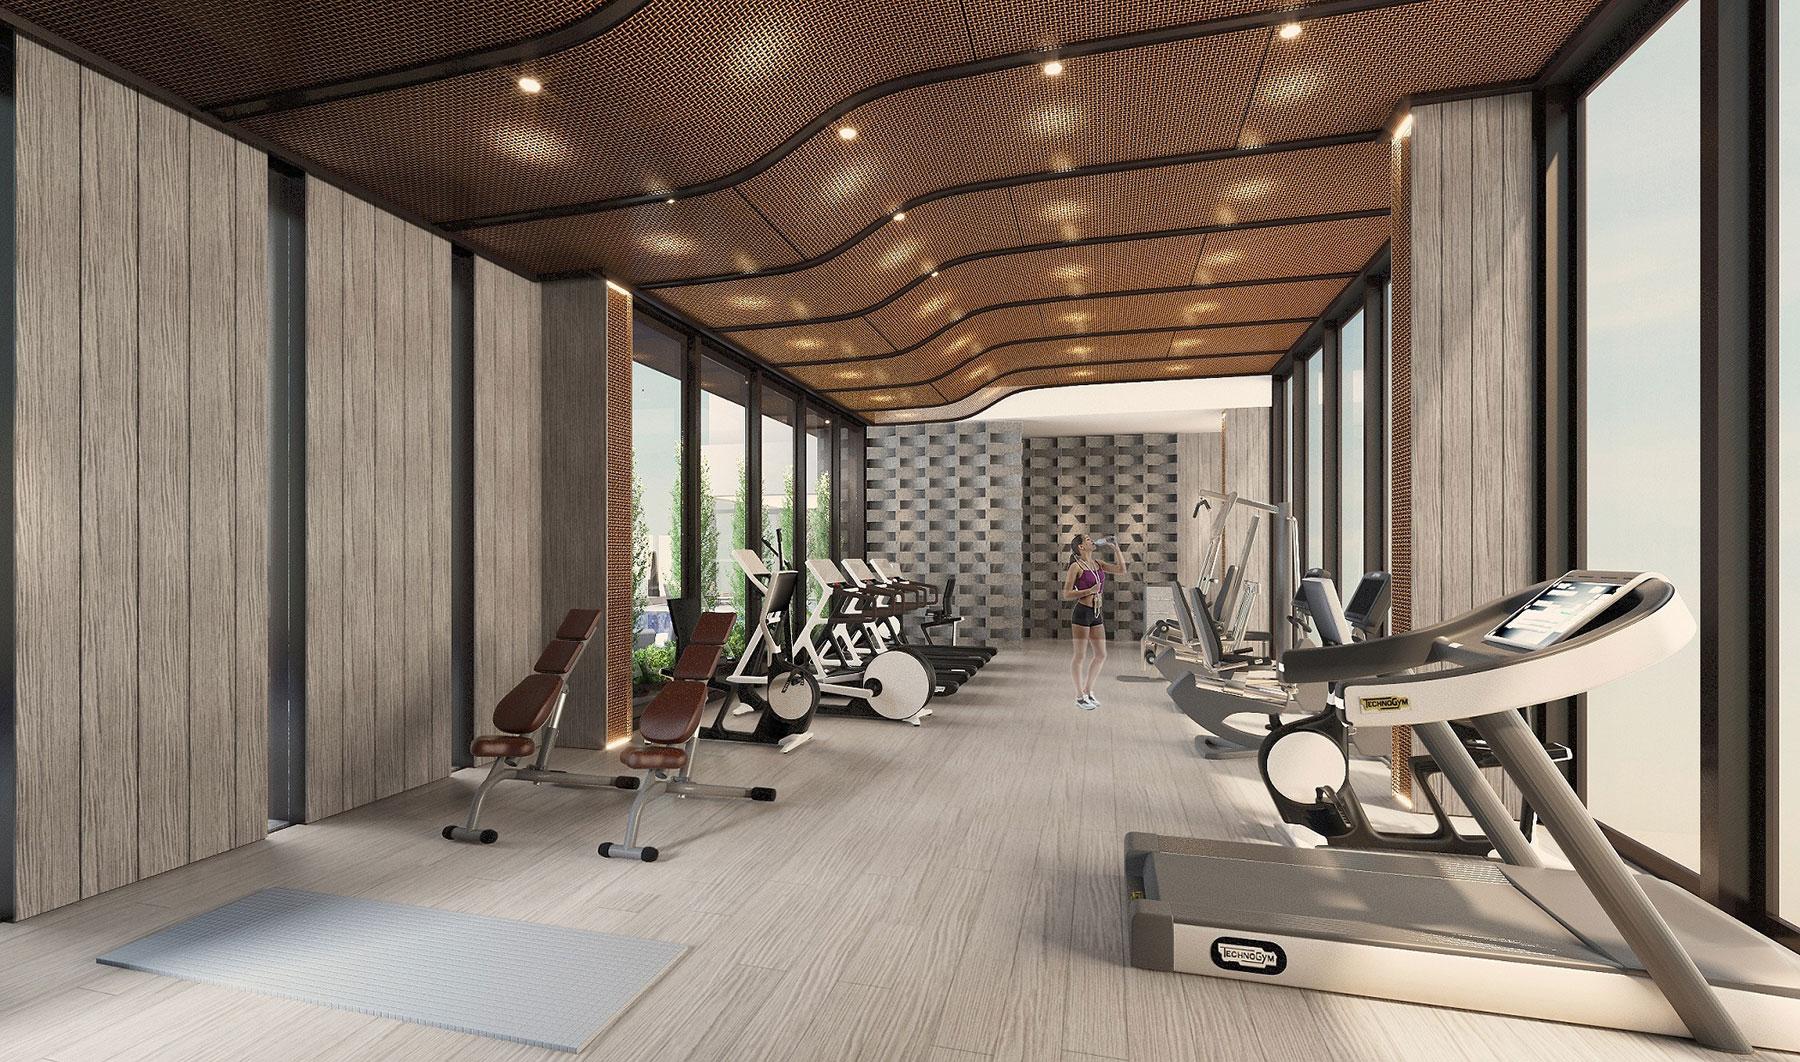 ALVA HOTEL BY ROYAL - Gym Room